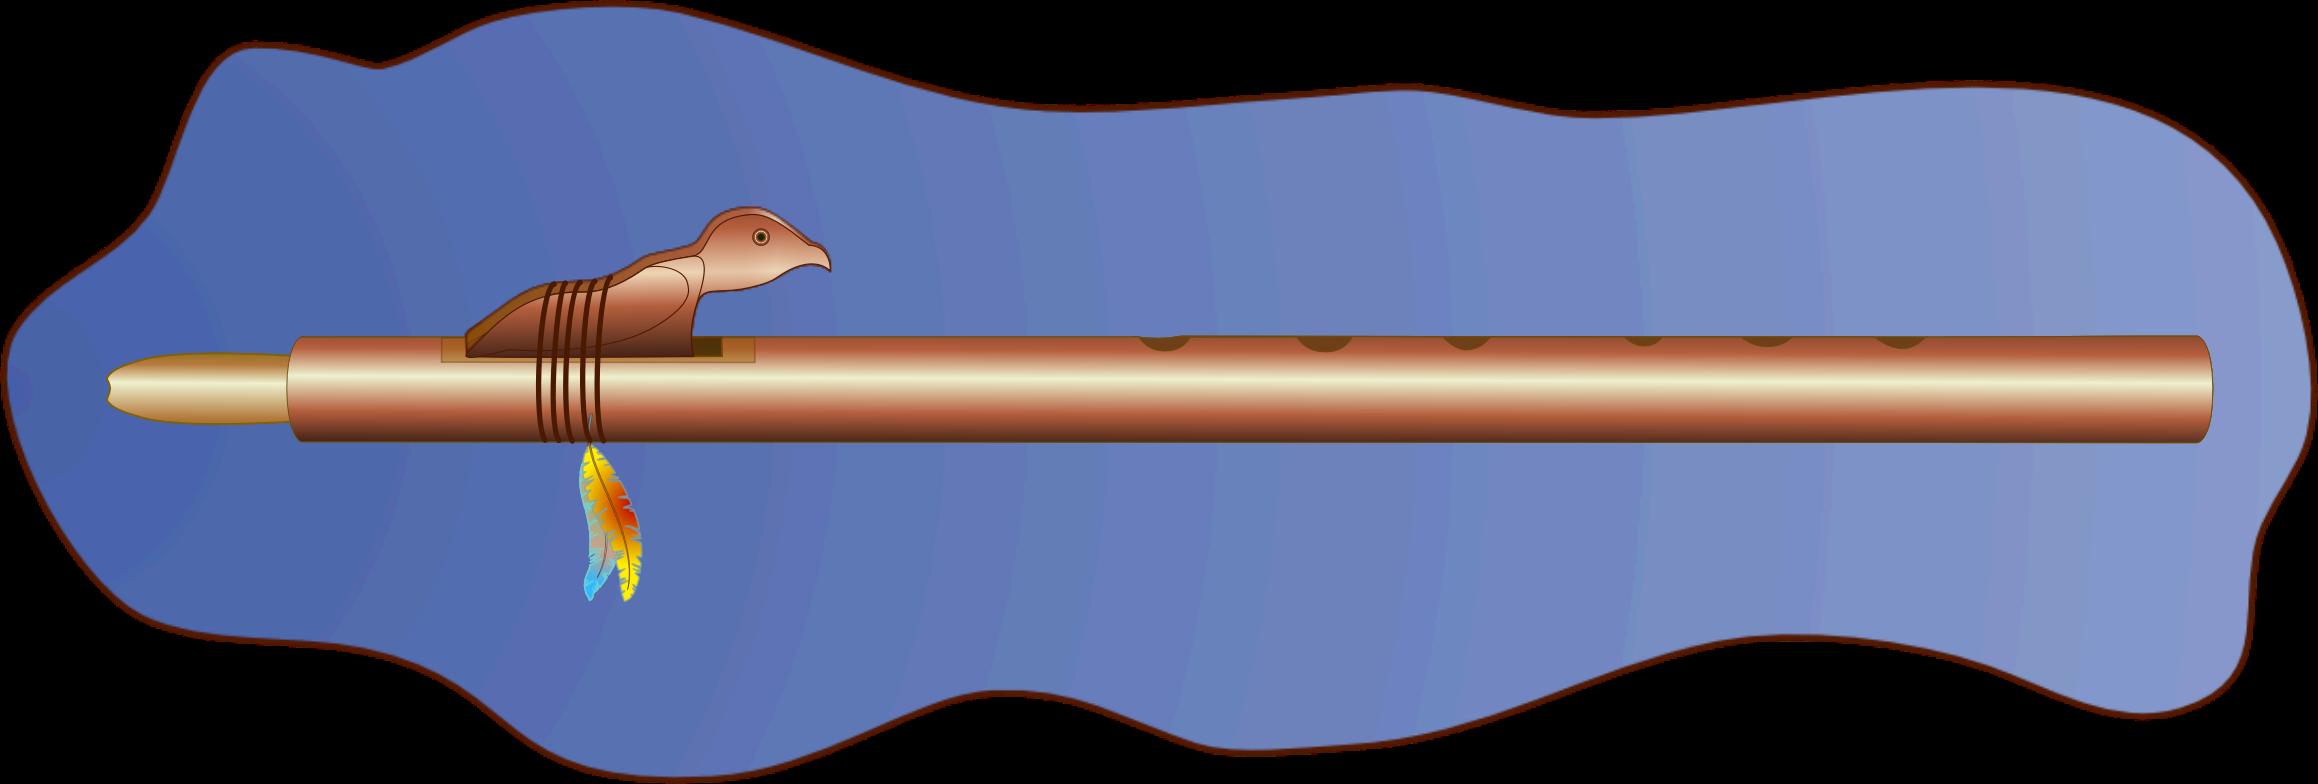 Big image png. Flute clipart native american flute